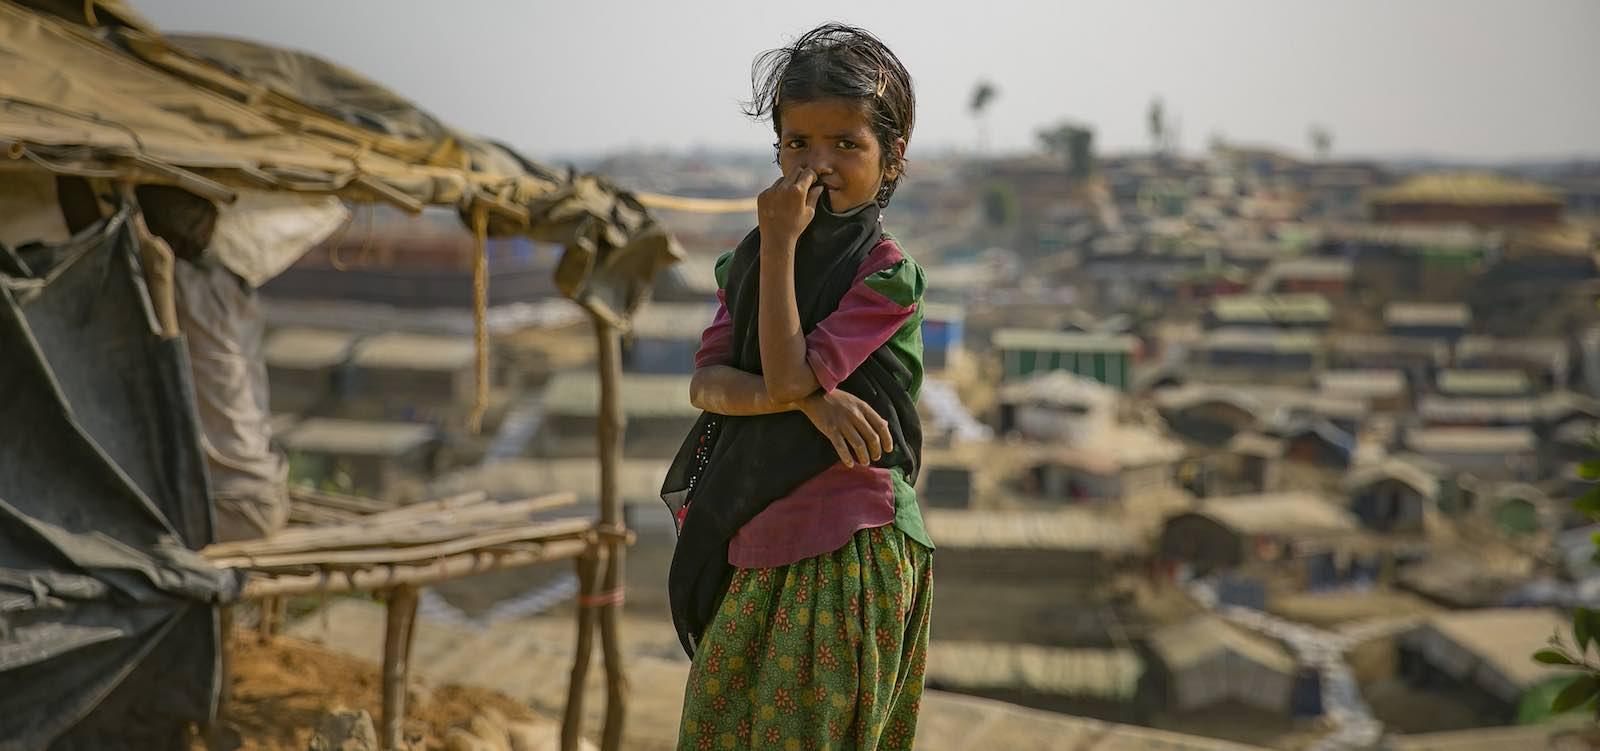 A refugee camp for Rohingya in Cox's Bazar, Bangladesh, in March (Photo: Allison Joyce/UN Women)